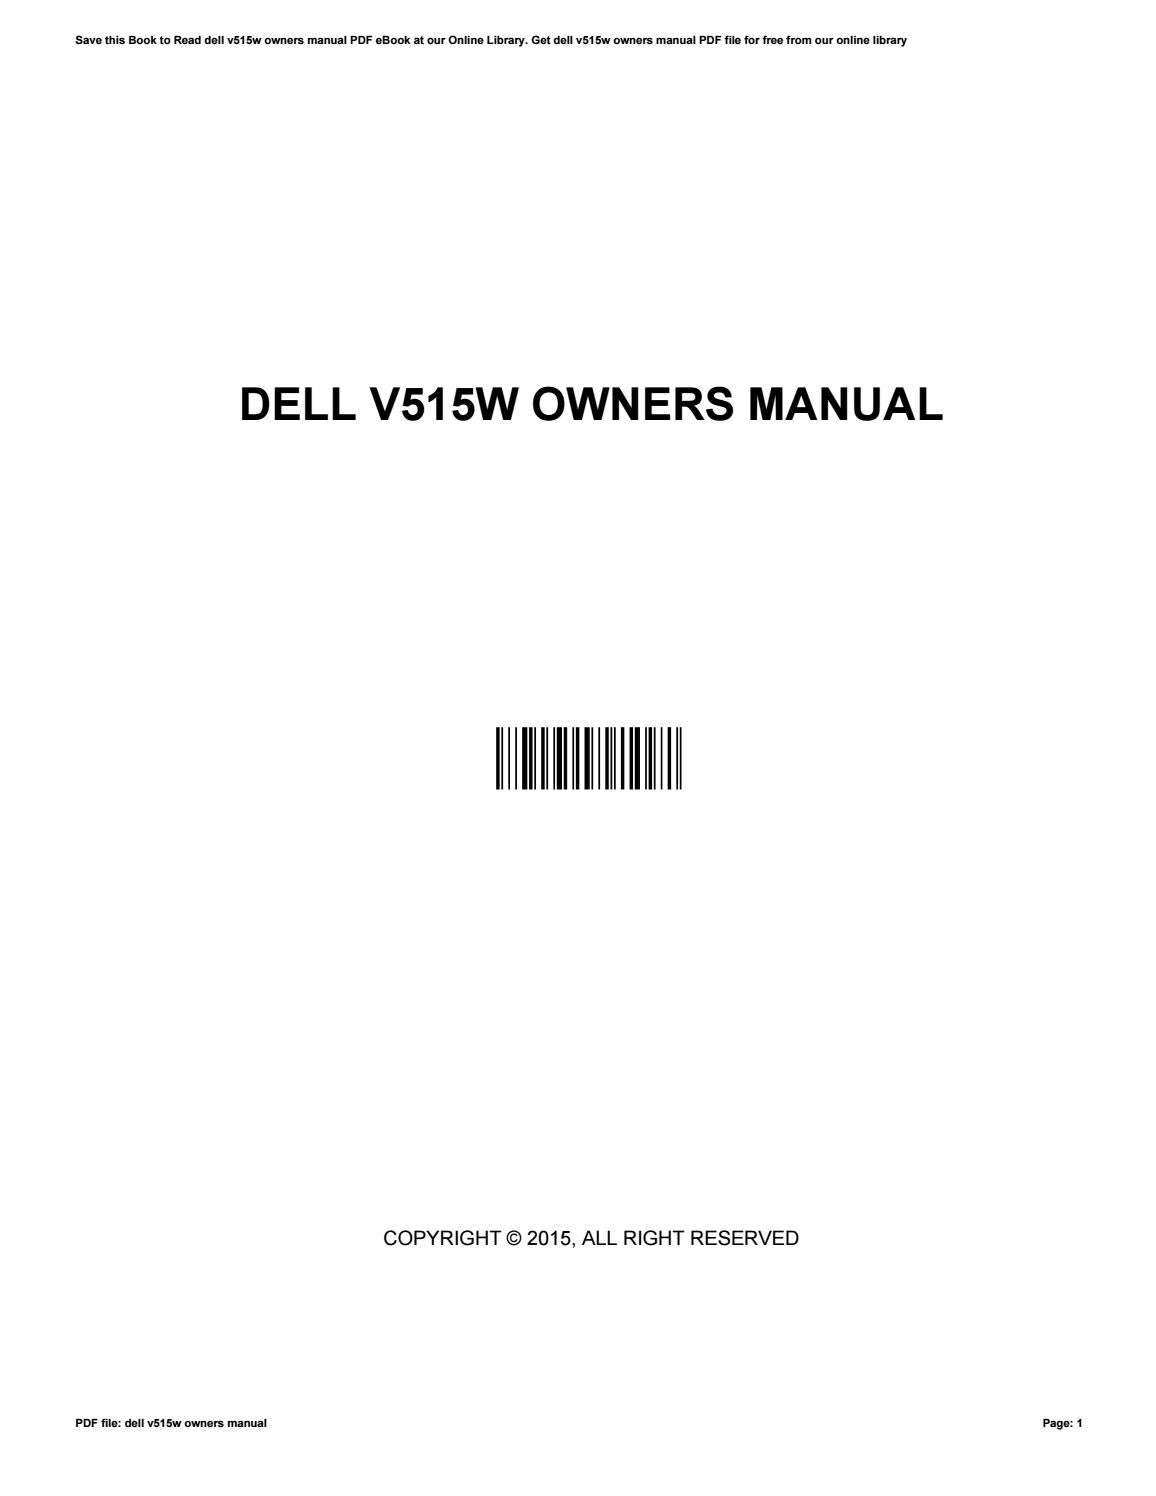 dell v515w owners manual by wesleylamb4850 issuu rh issuu com dell v515w  user manual Dell V313w